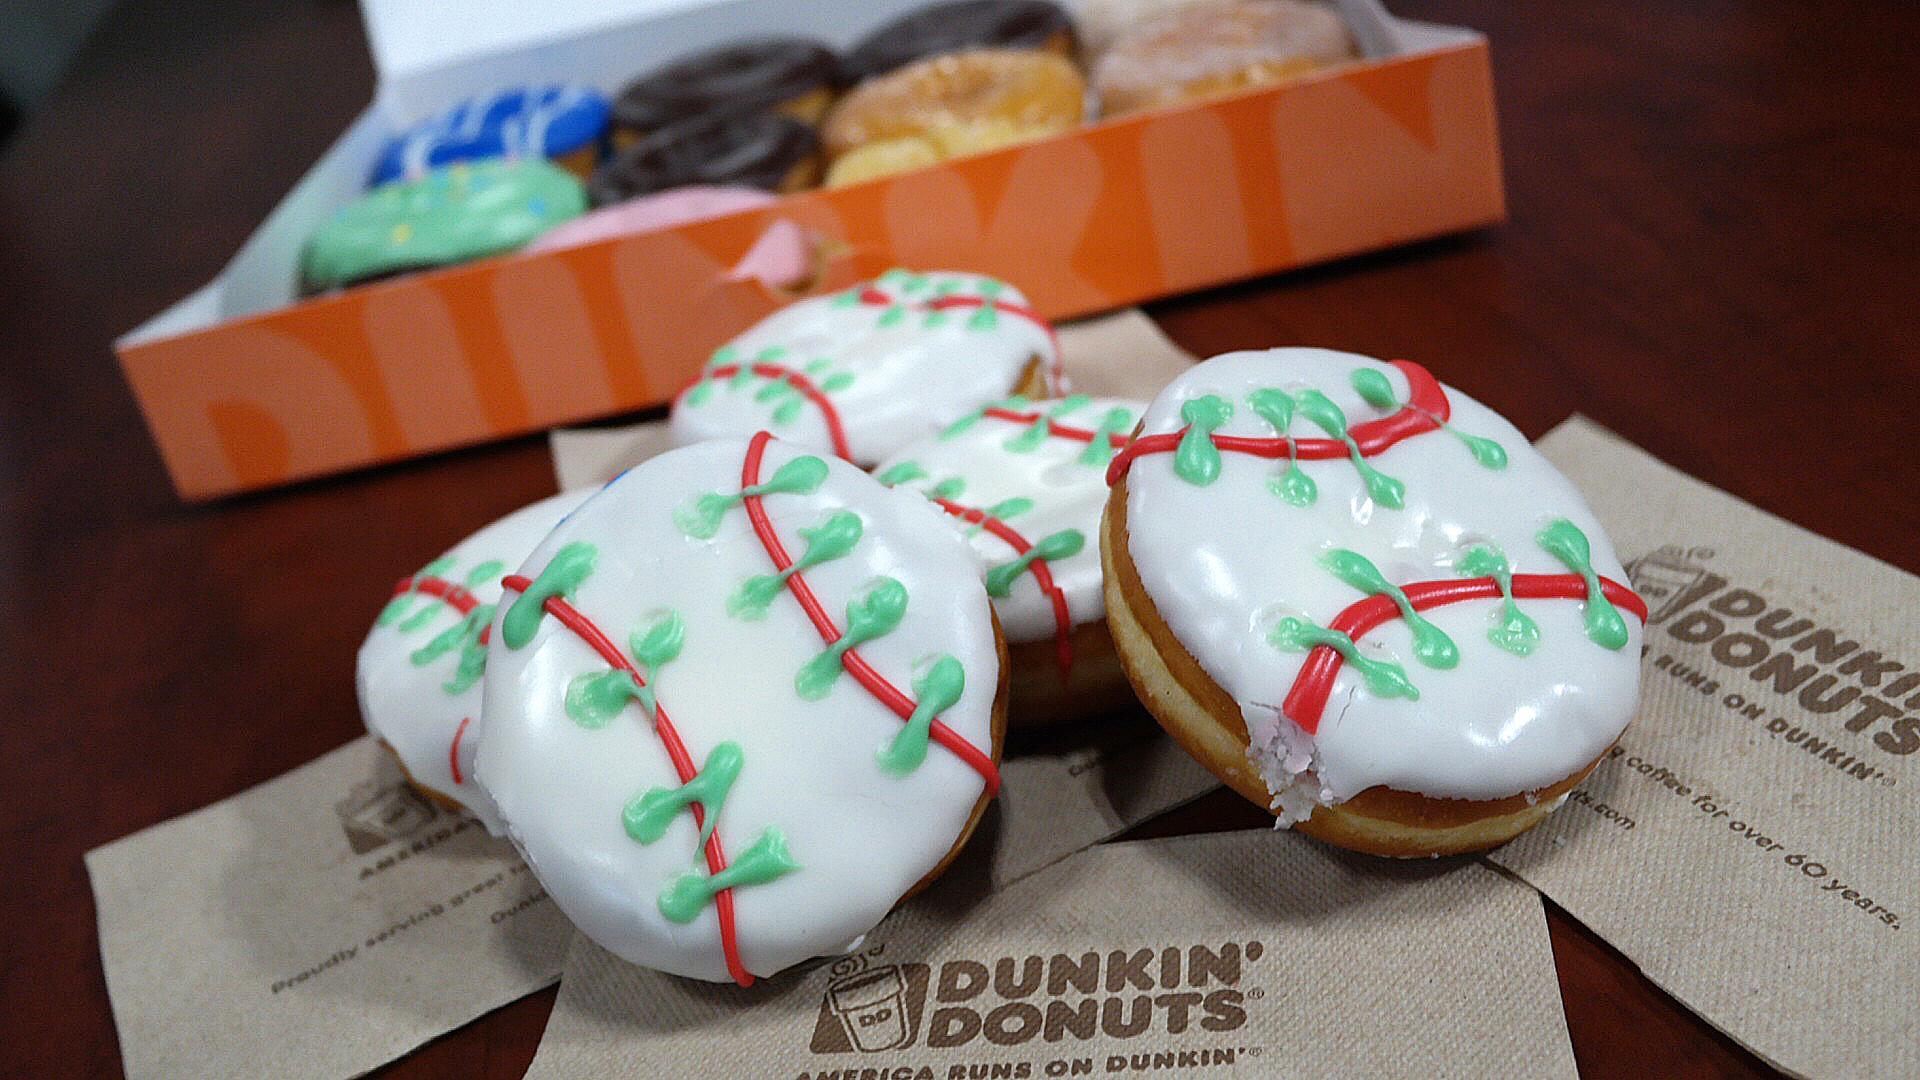 Dunkin Donuts Fort Wayne TinCaps_258453